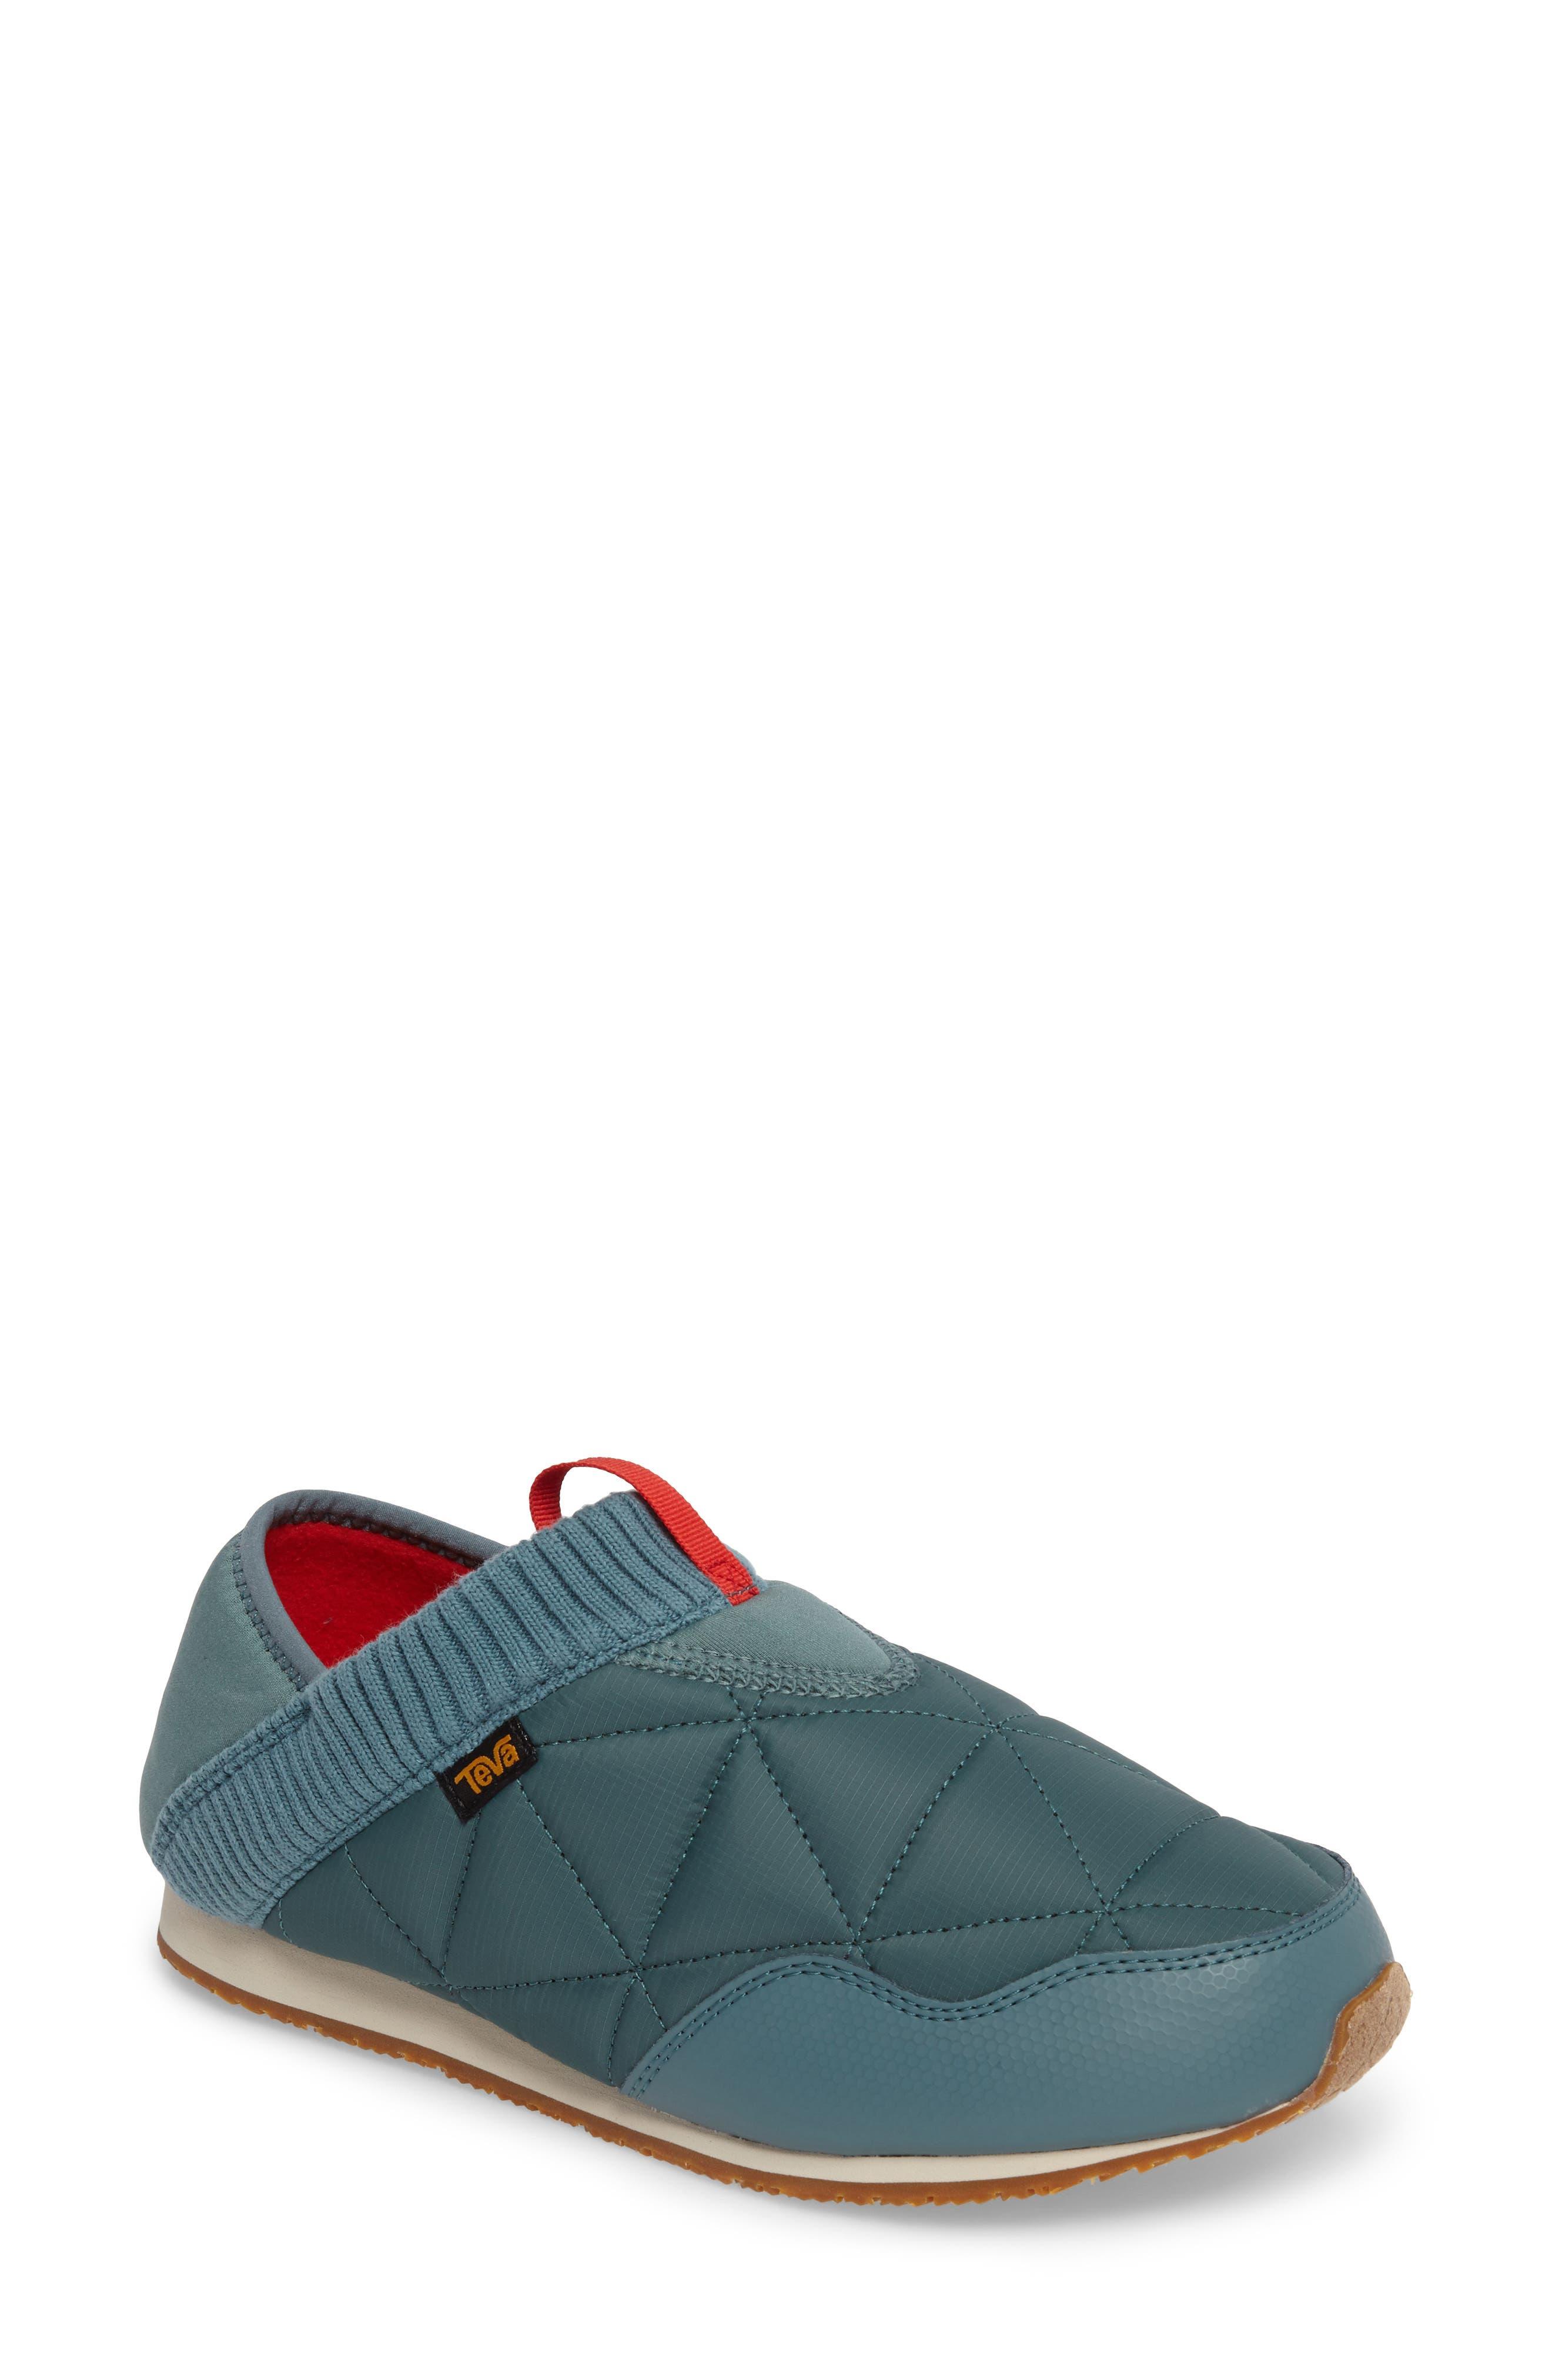 Ember Convertible Slip-On,                         Main,                         color, North Atlantic Fabric